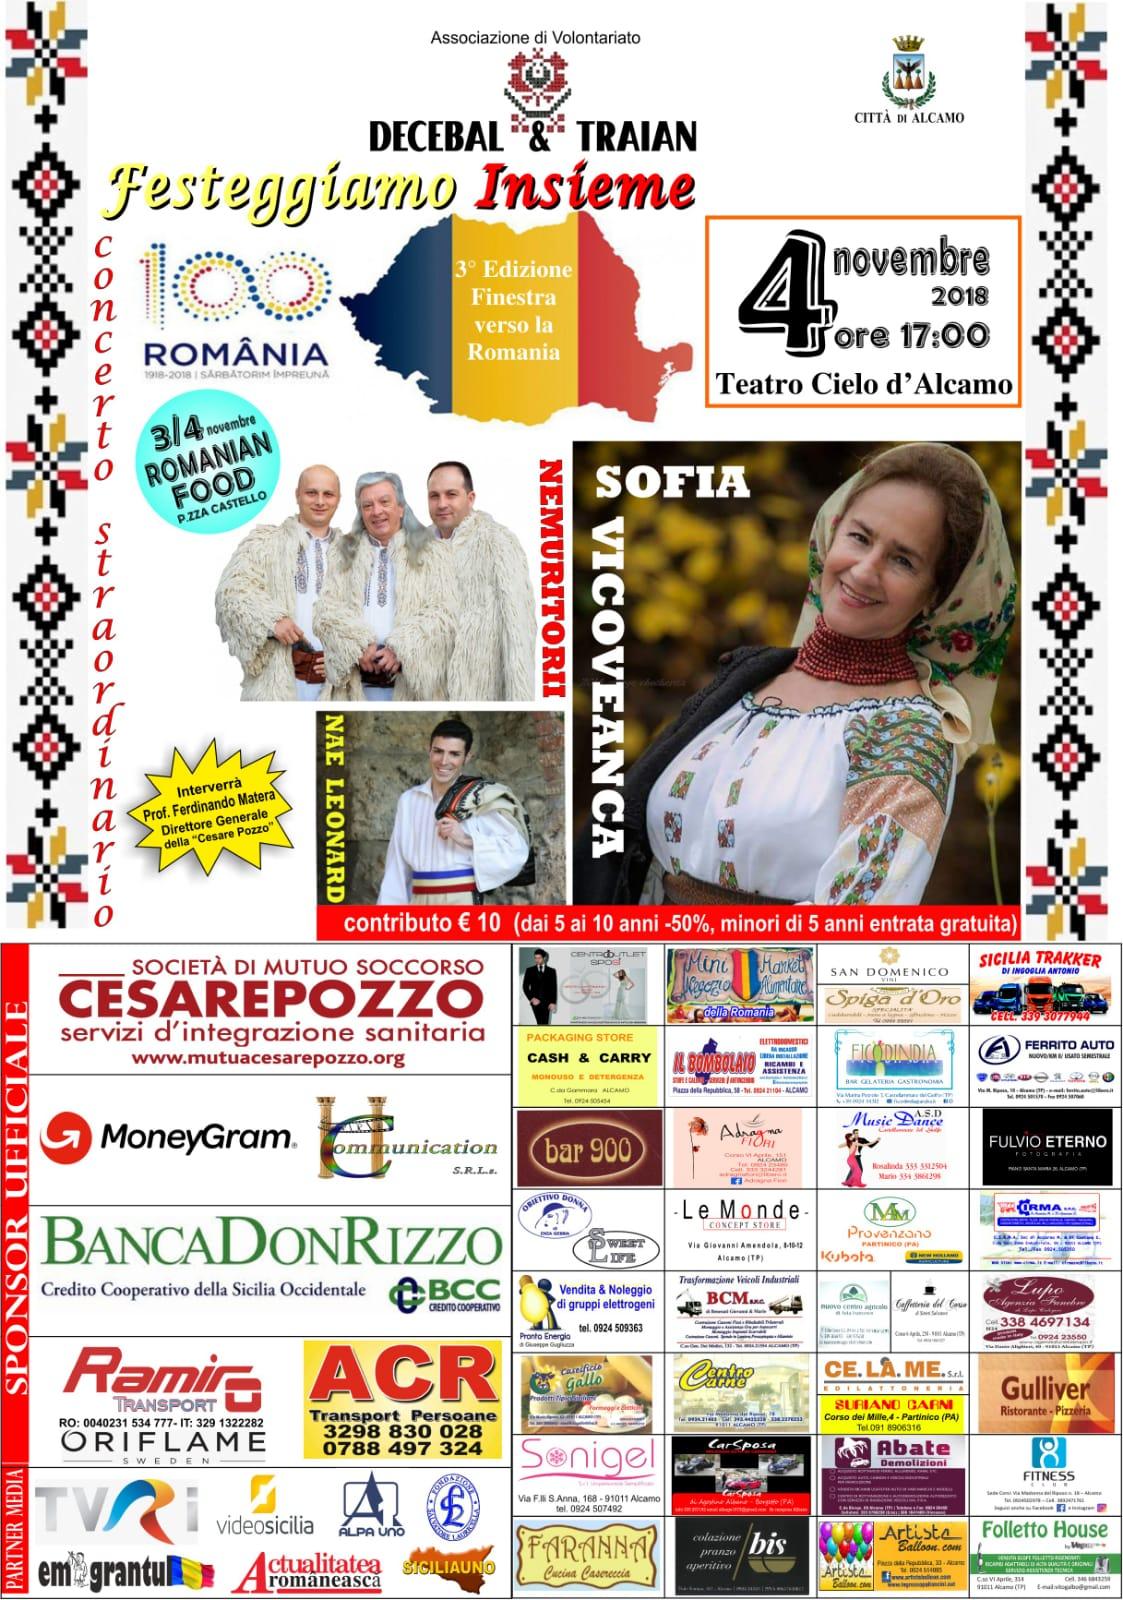 3° Ediz. Finestra verso la Romania - Alcamo